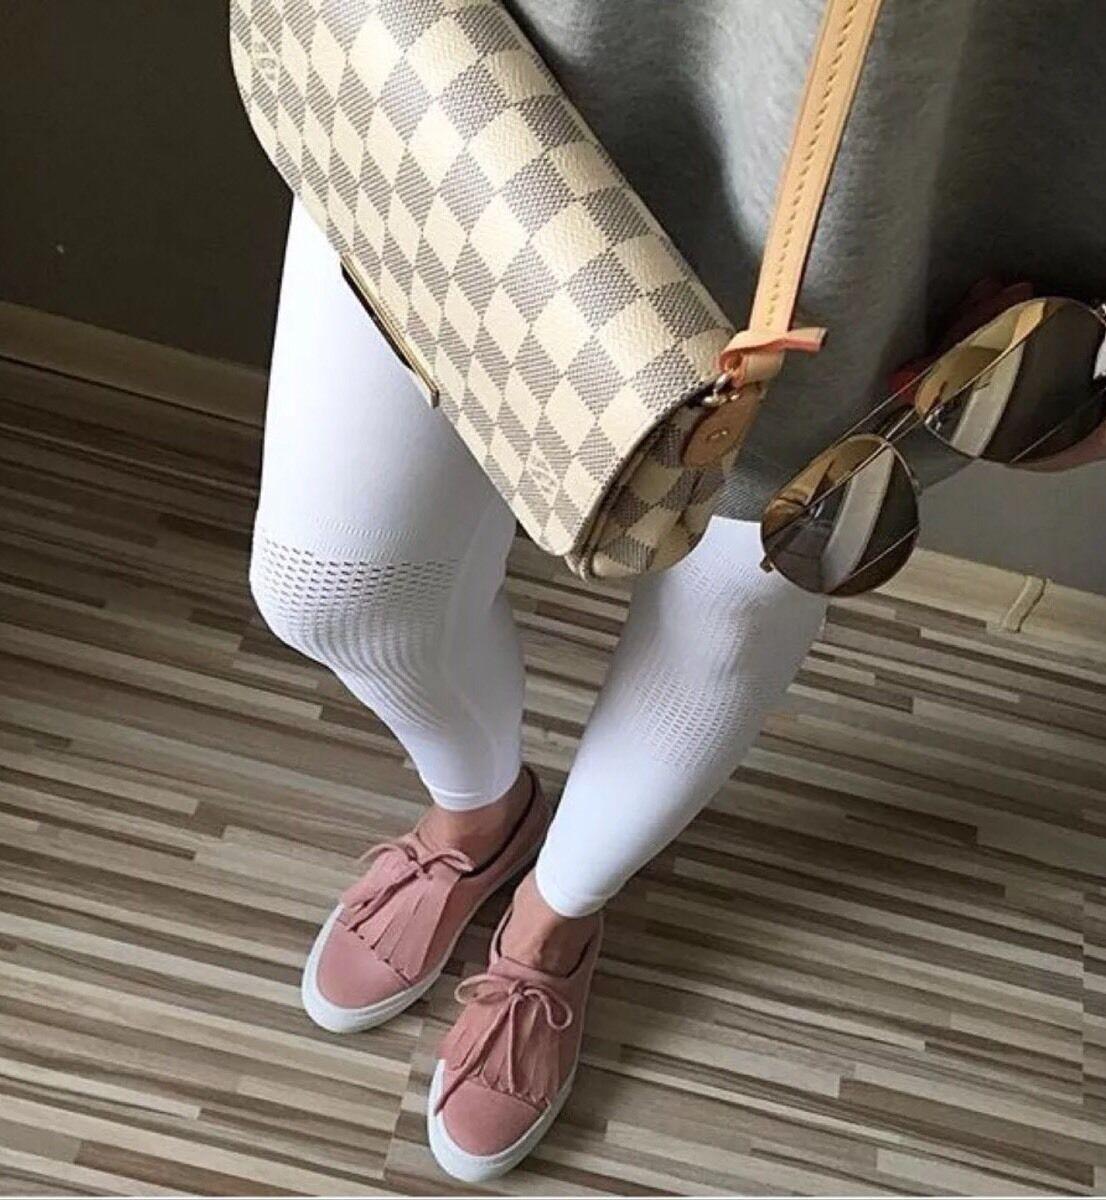 Pink Zara Flats Fringed Leder Plimsolls 3 Flats Zara Schuhes New BNWT Sold Out Trainers 6dd5ac